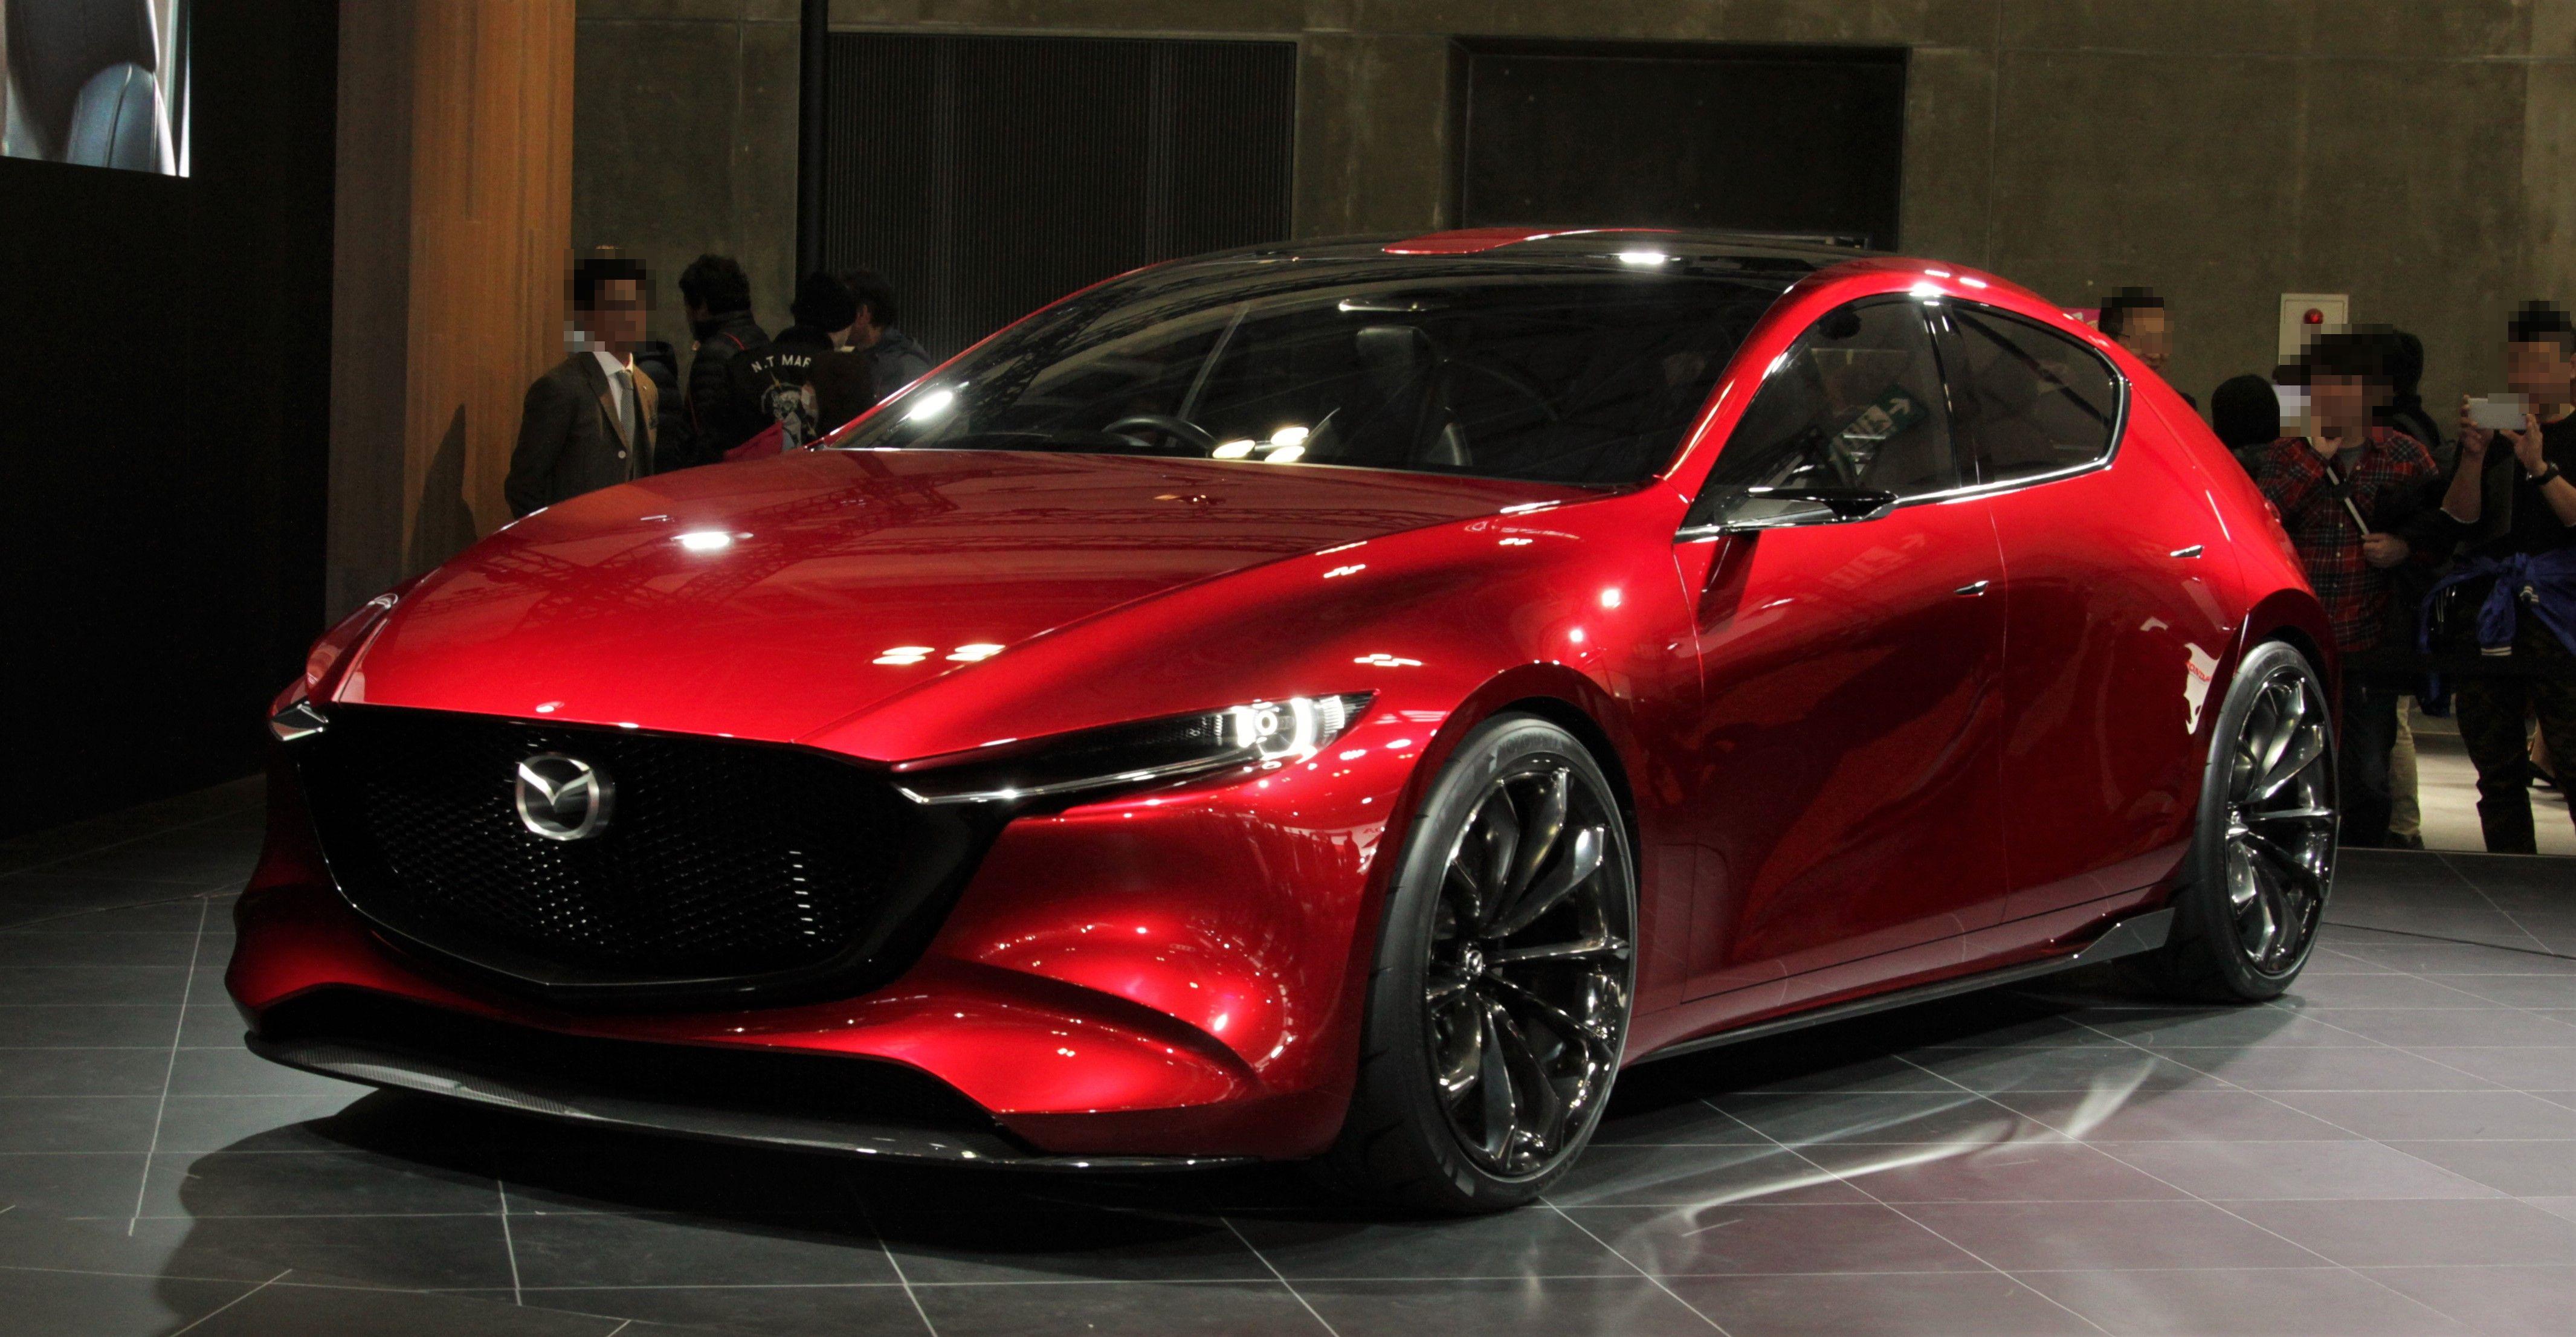 https://upload.wikimedia.org/wikipedia/commons/6/65/Mazda_Kai_Concept.jpg